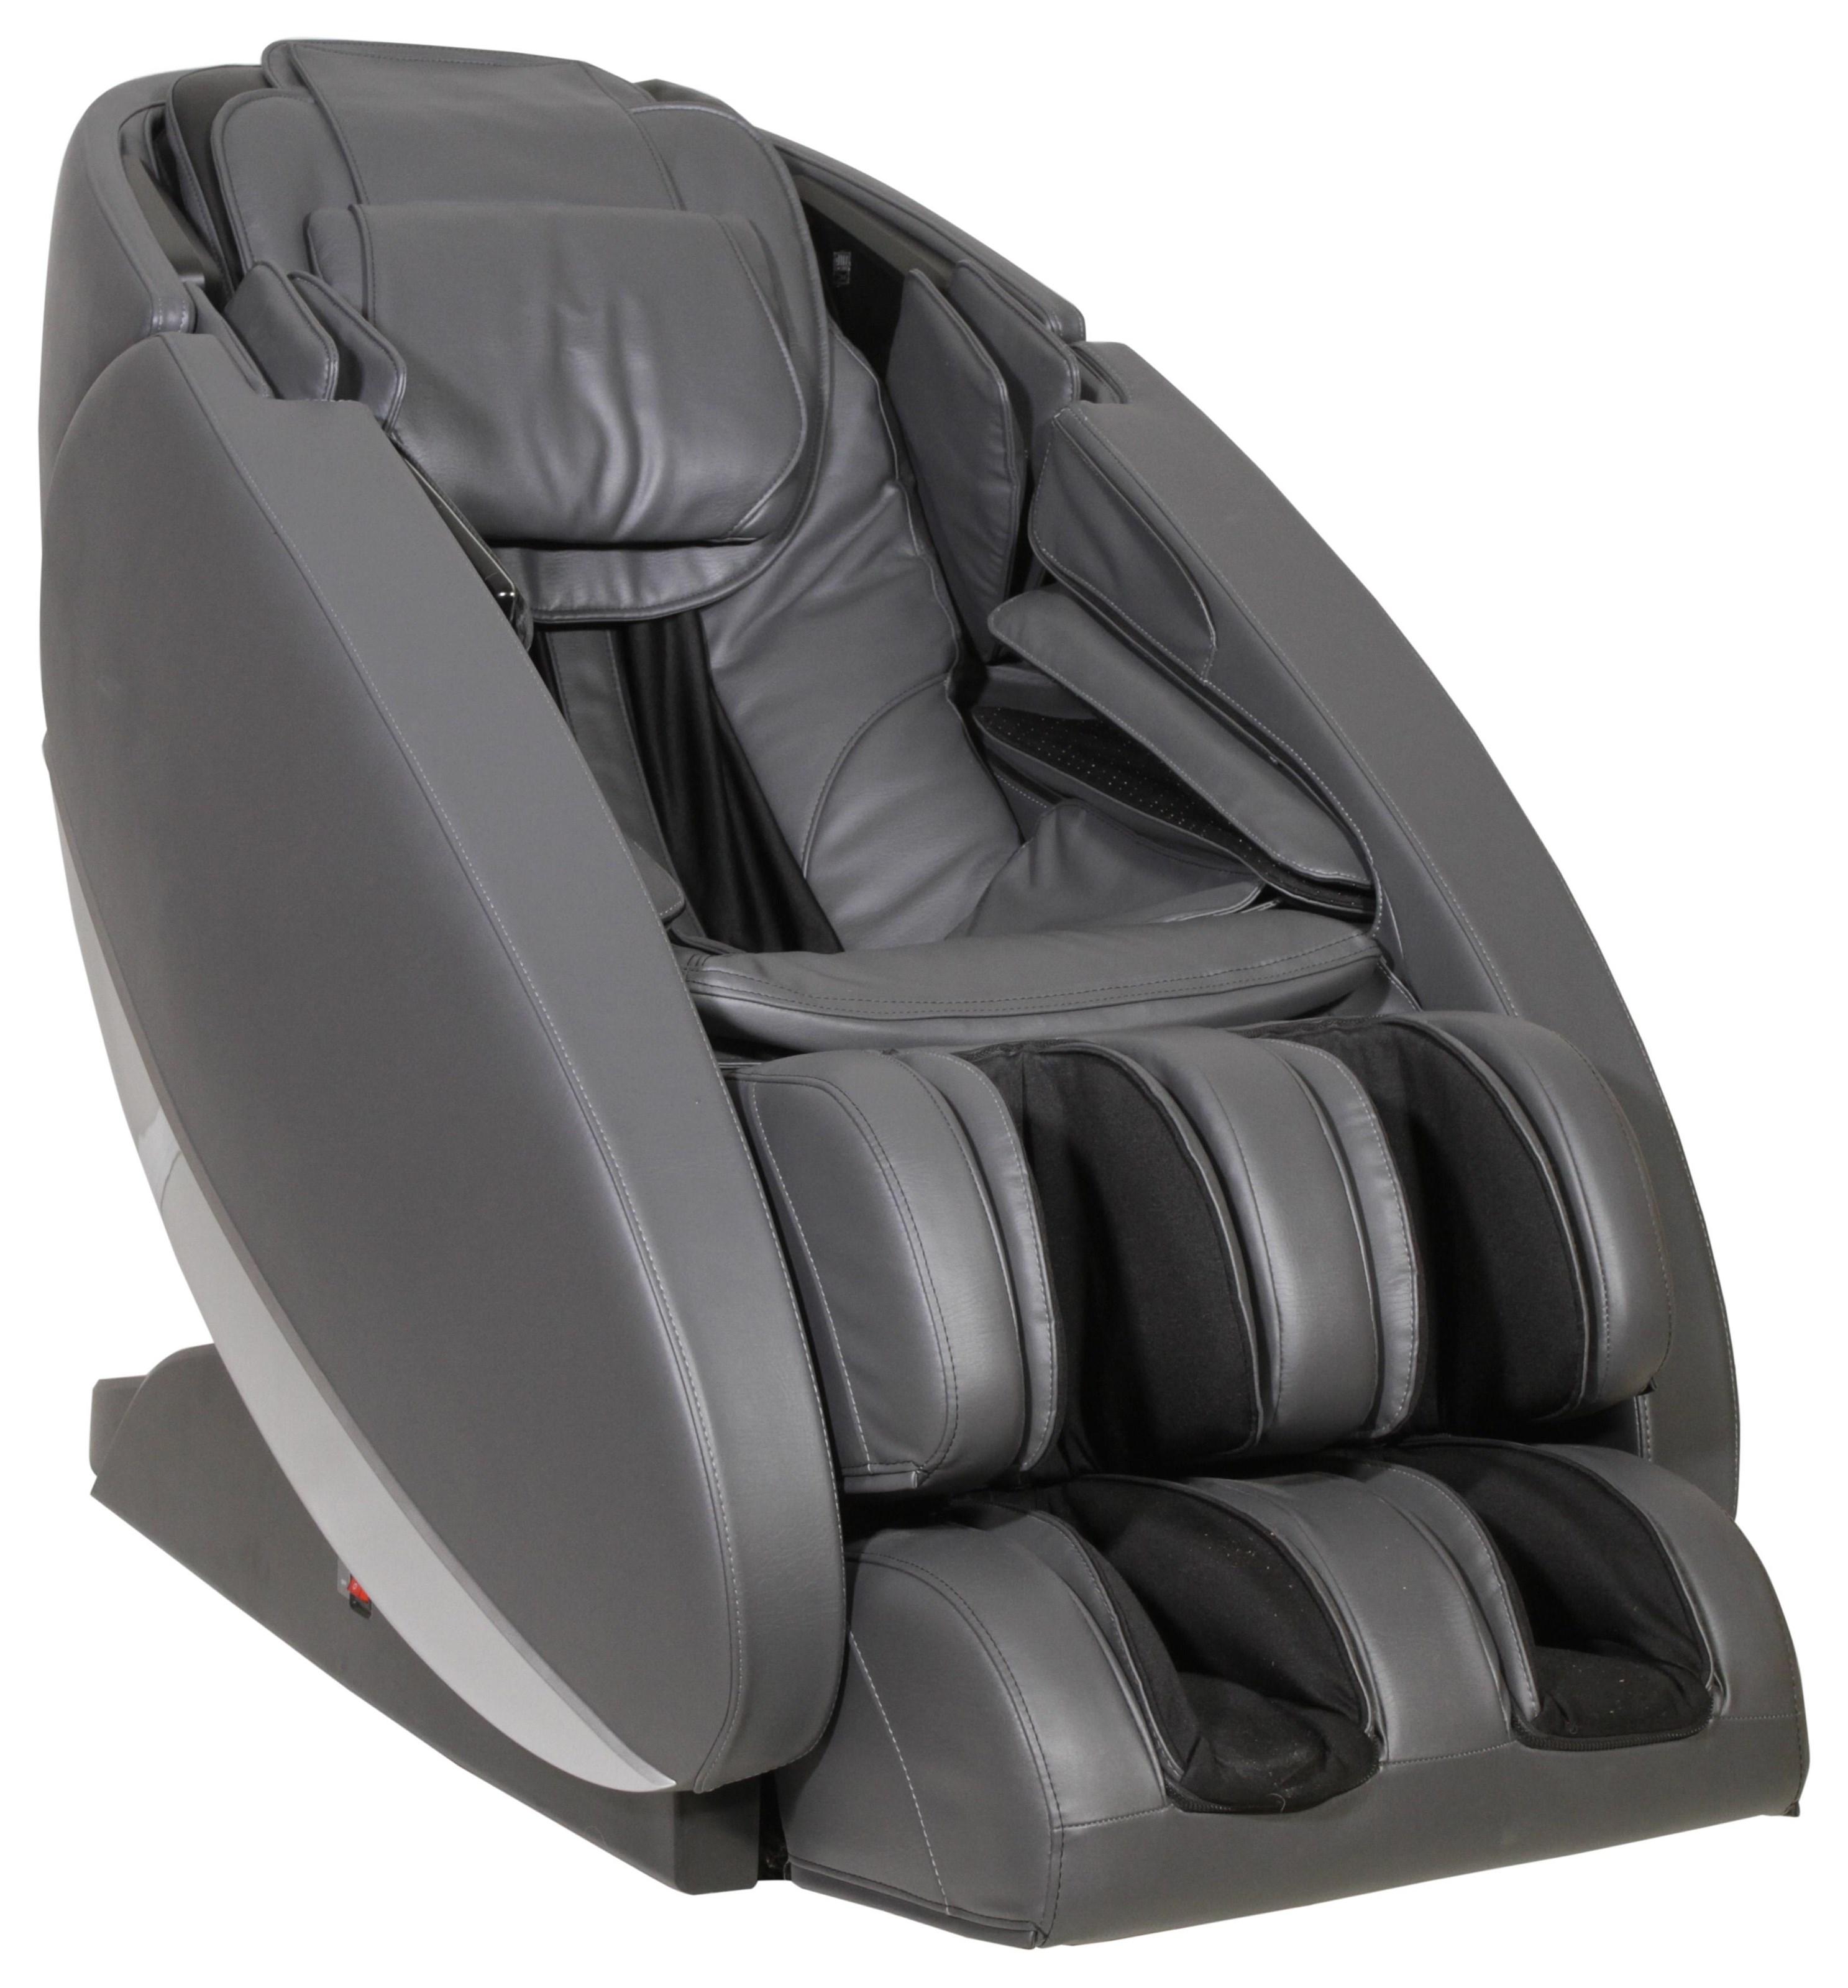 Novo XT2 Massage Chair by Human Touch at HomeWorld Furniture